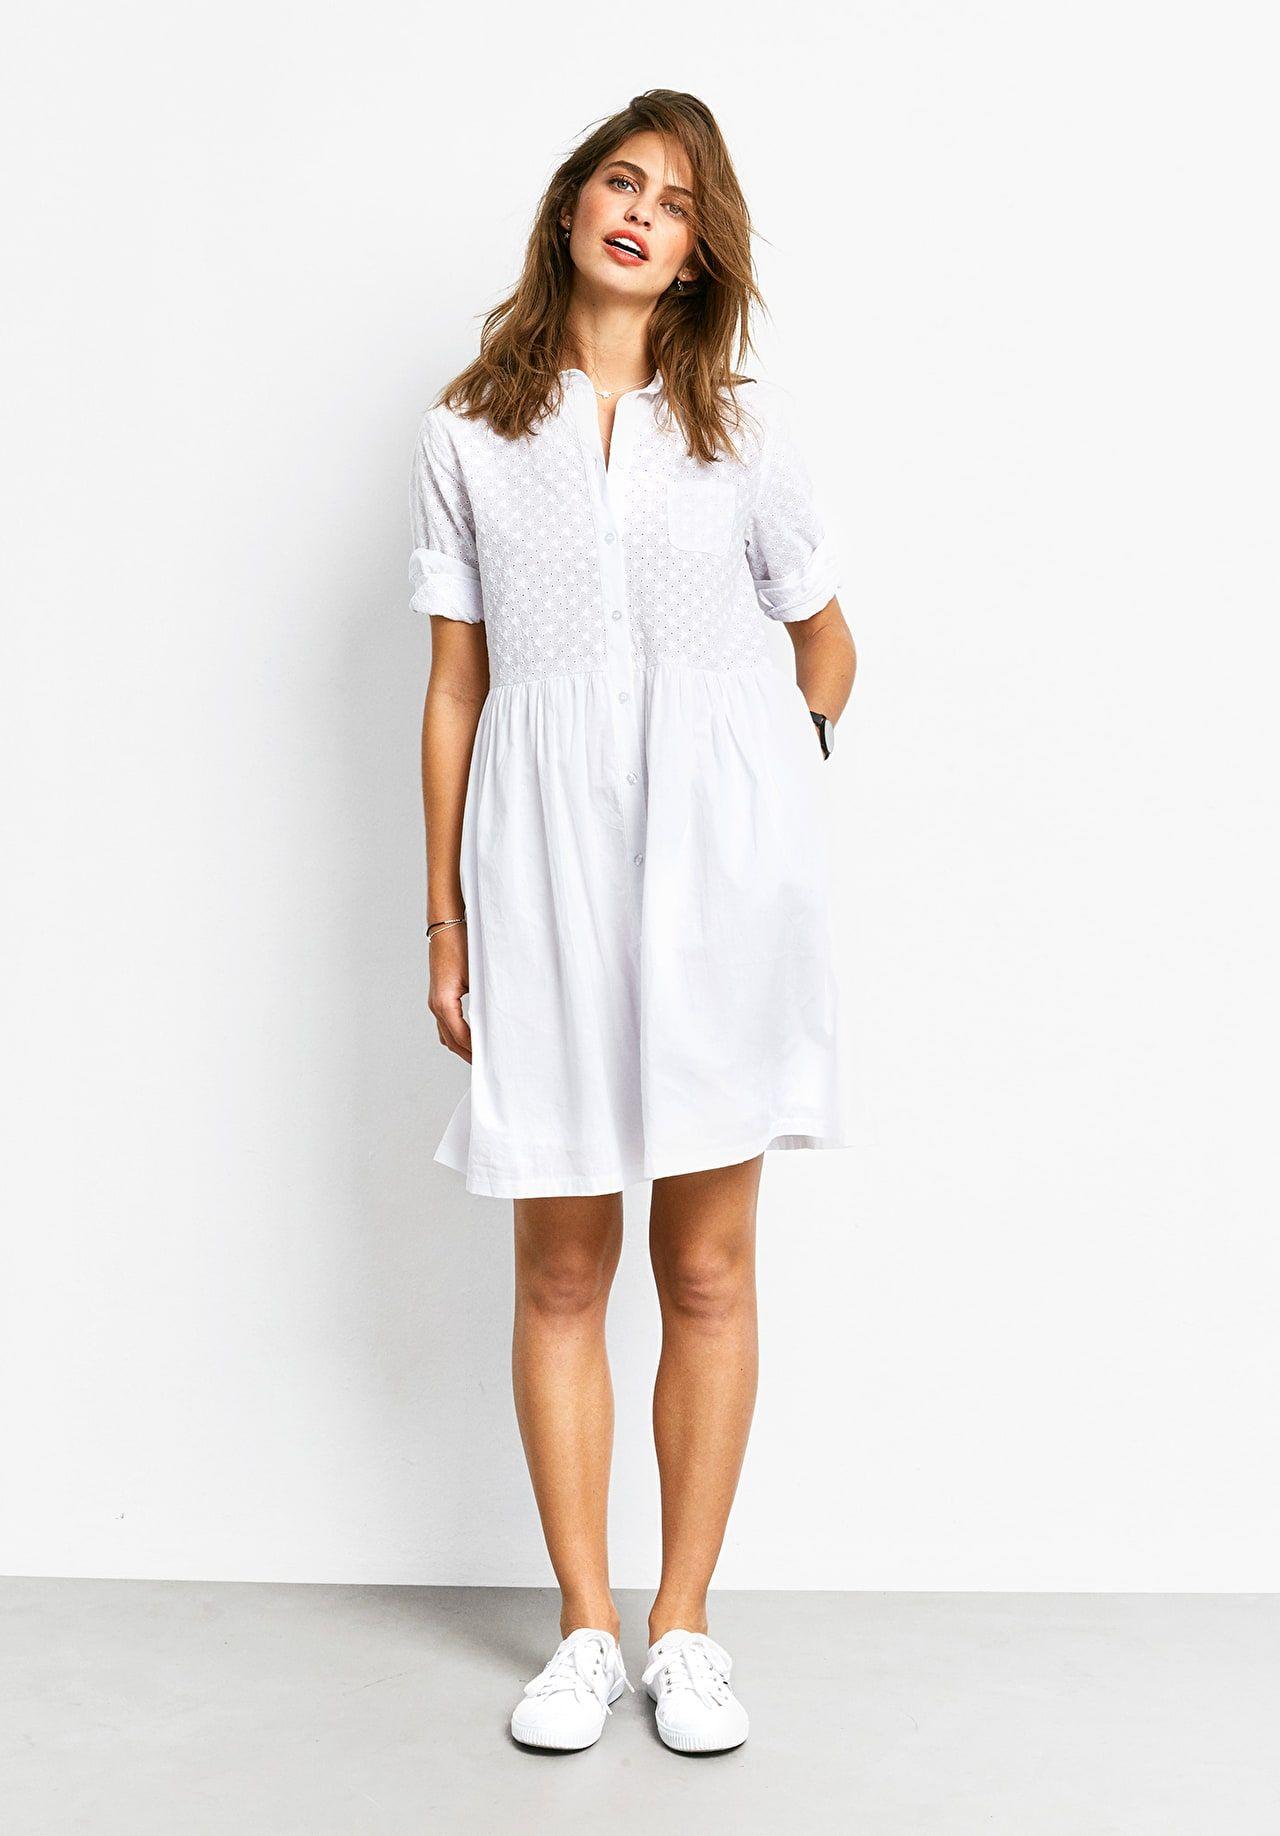 Camellia Dress Hush Wish List Pinterest Dresses Cotton